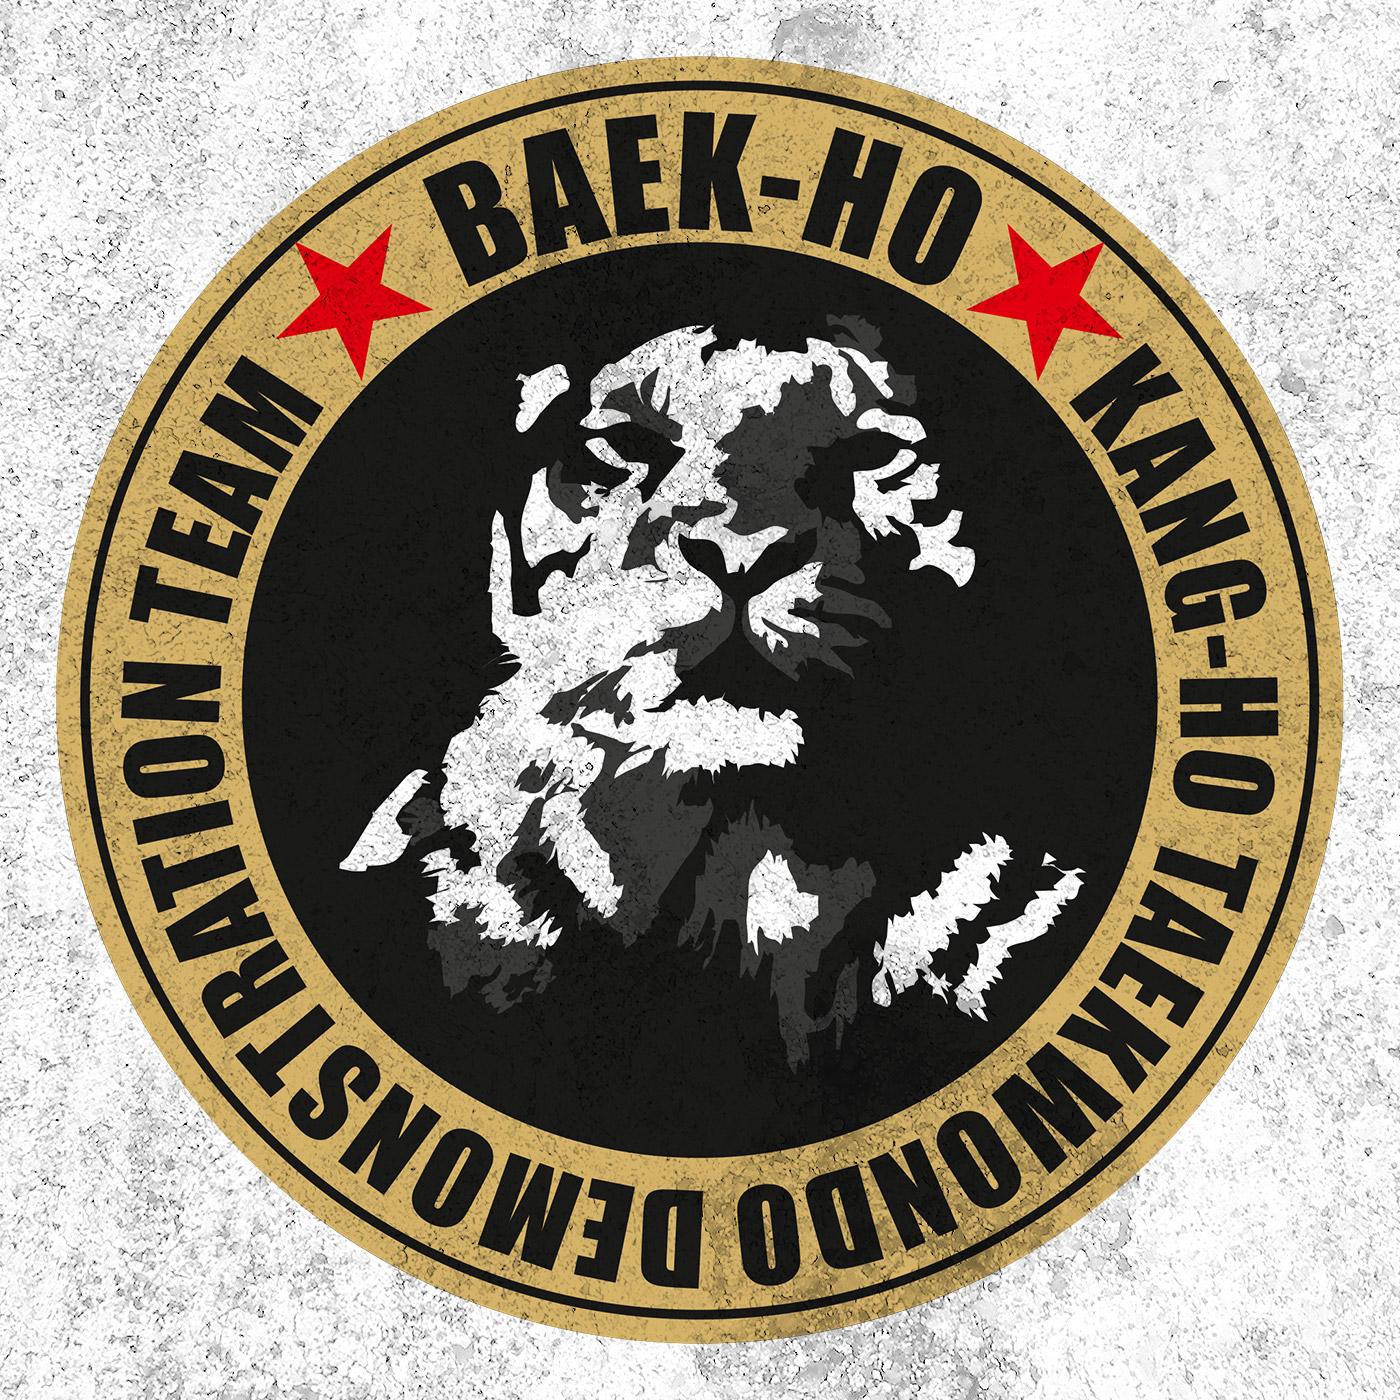 Kang-Ho équipe de démonstration, Baek-Ho